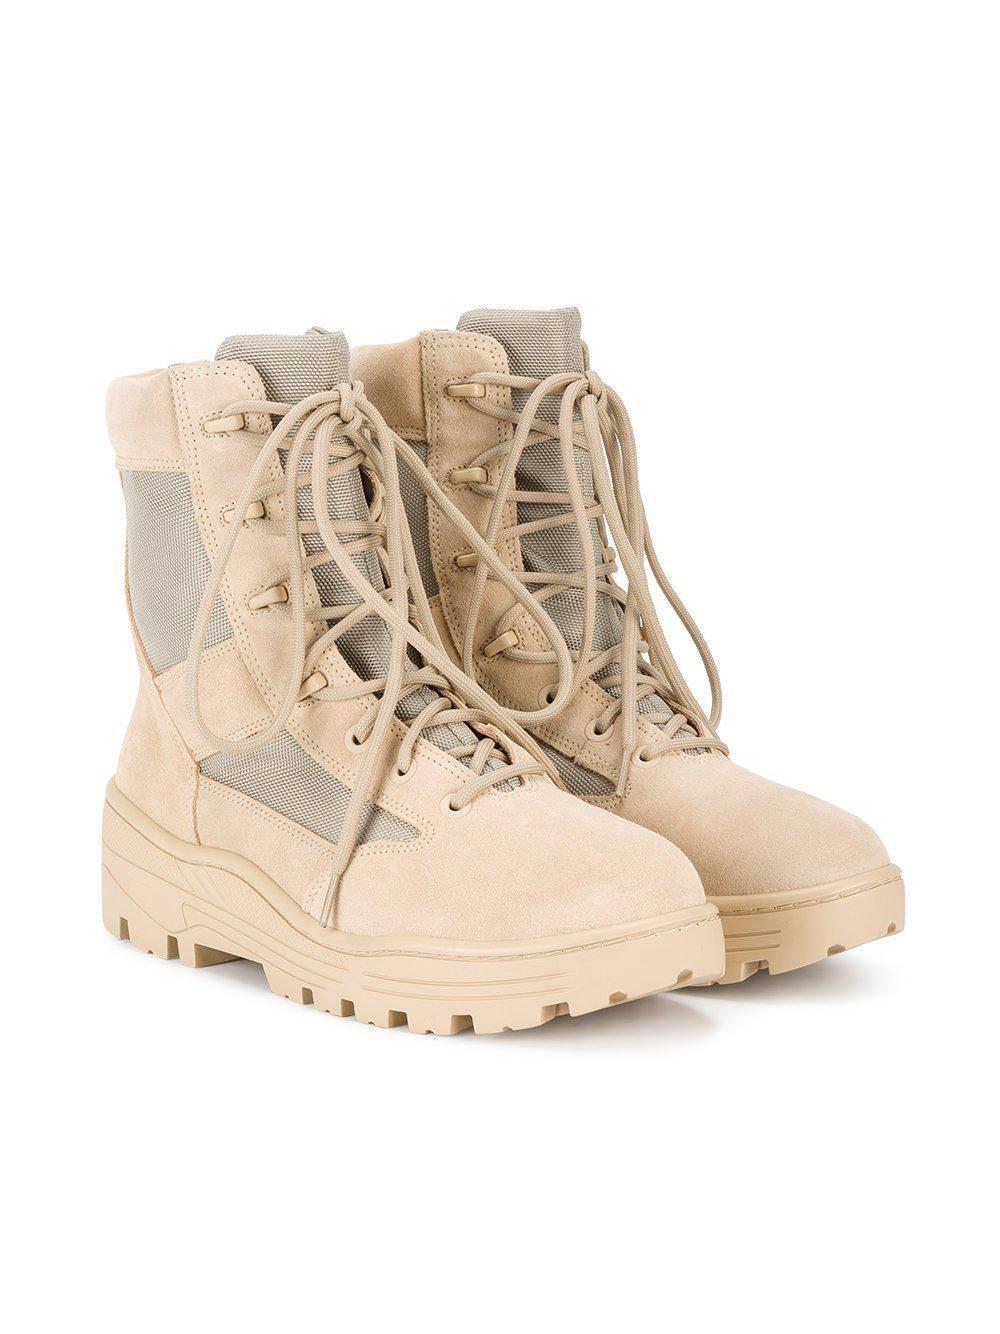 44e9e0ac70726 Lyst - Yeezy Combat Boot Crosta Light Sand Calfskin Suede in Natural ...